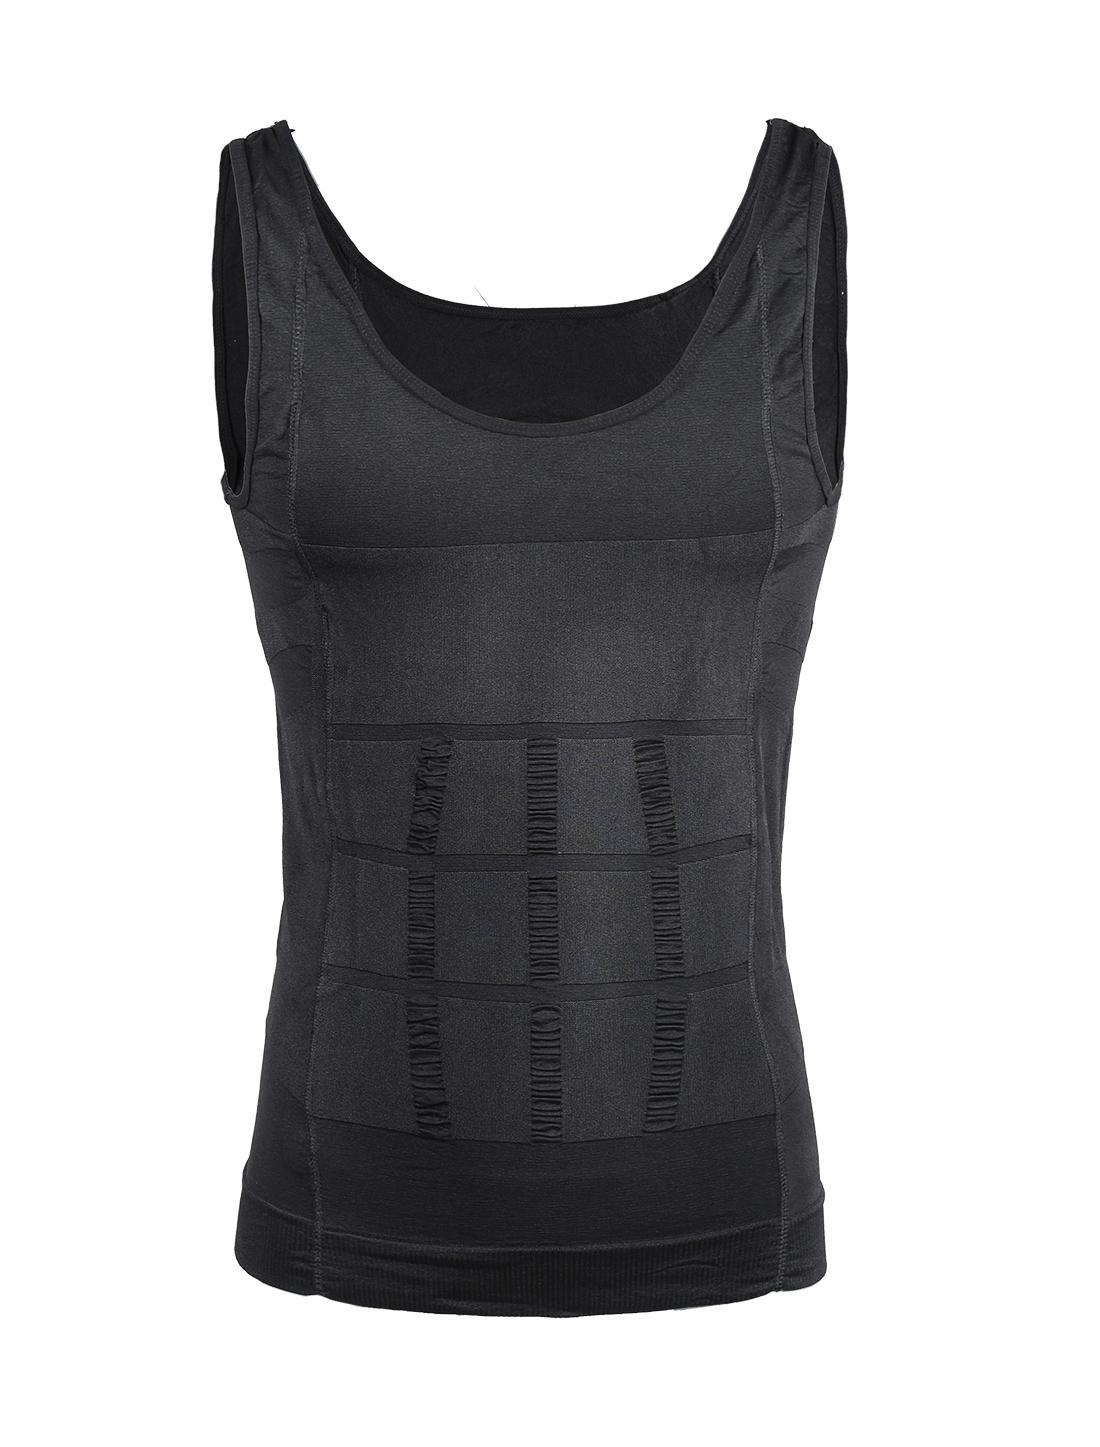 Men Compression Slimming Body Tummy Waist Shapewear Tank Top Gray Large